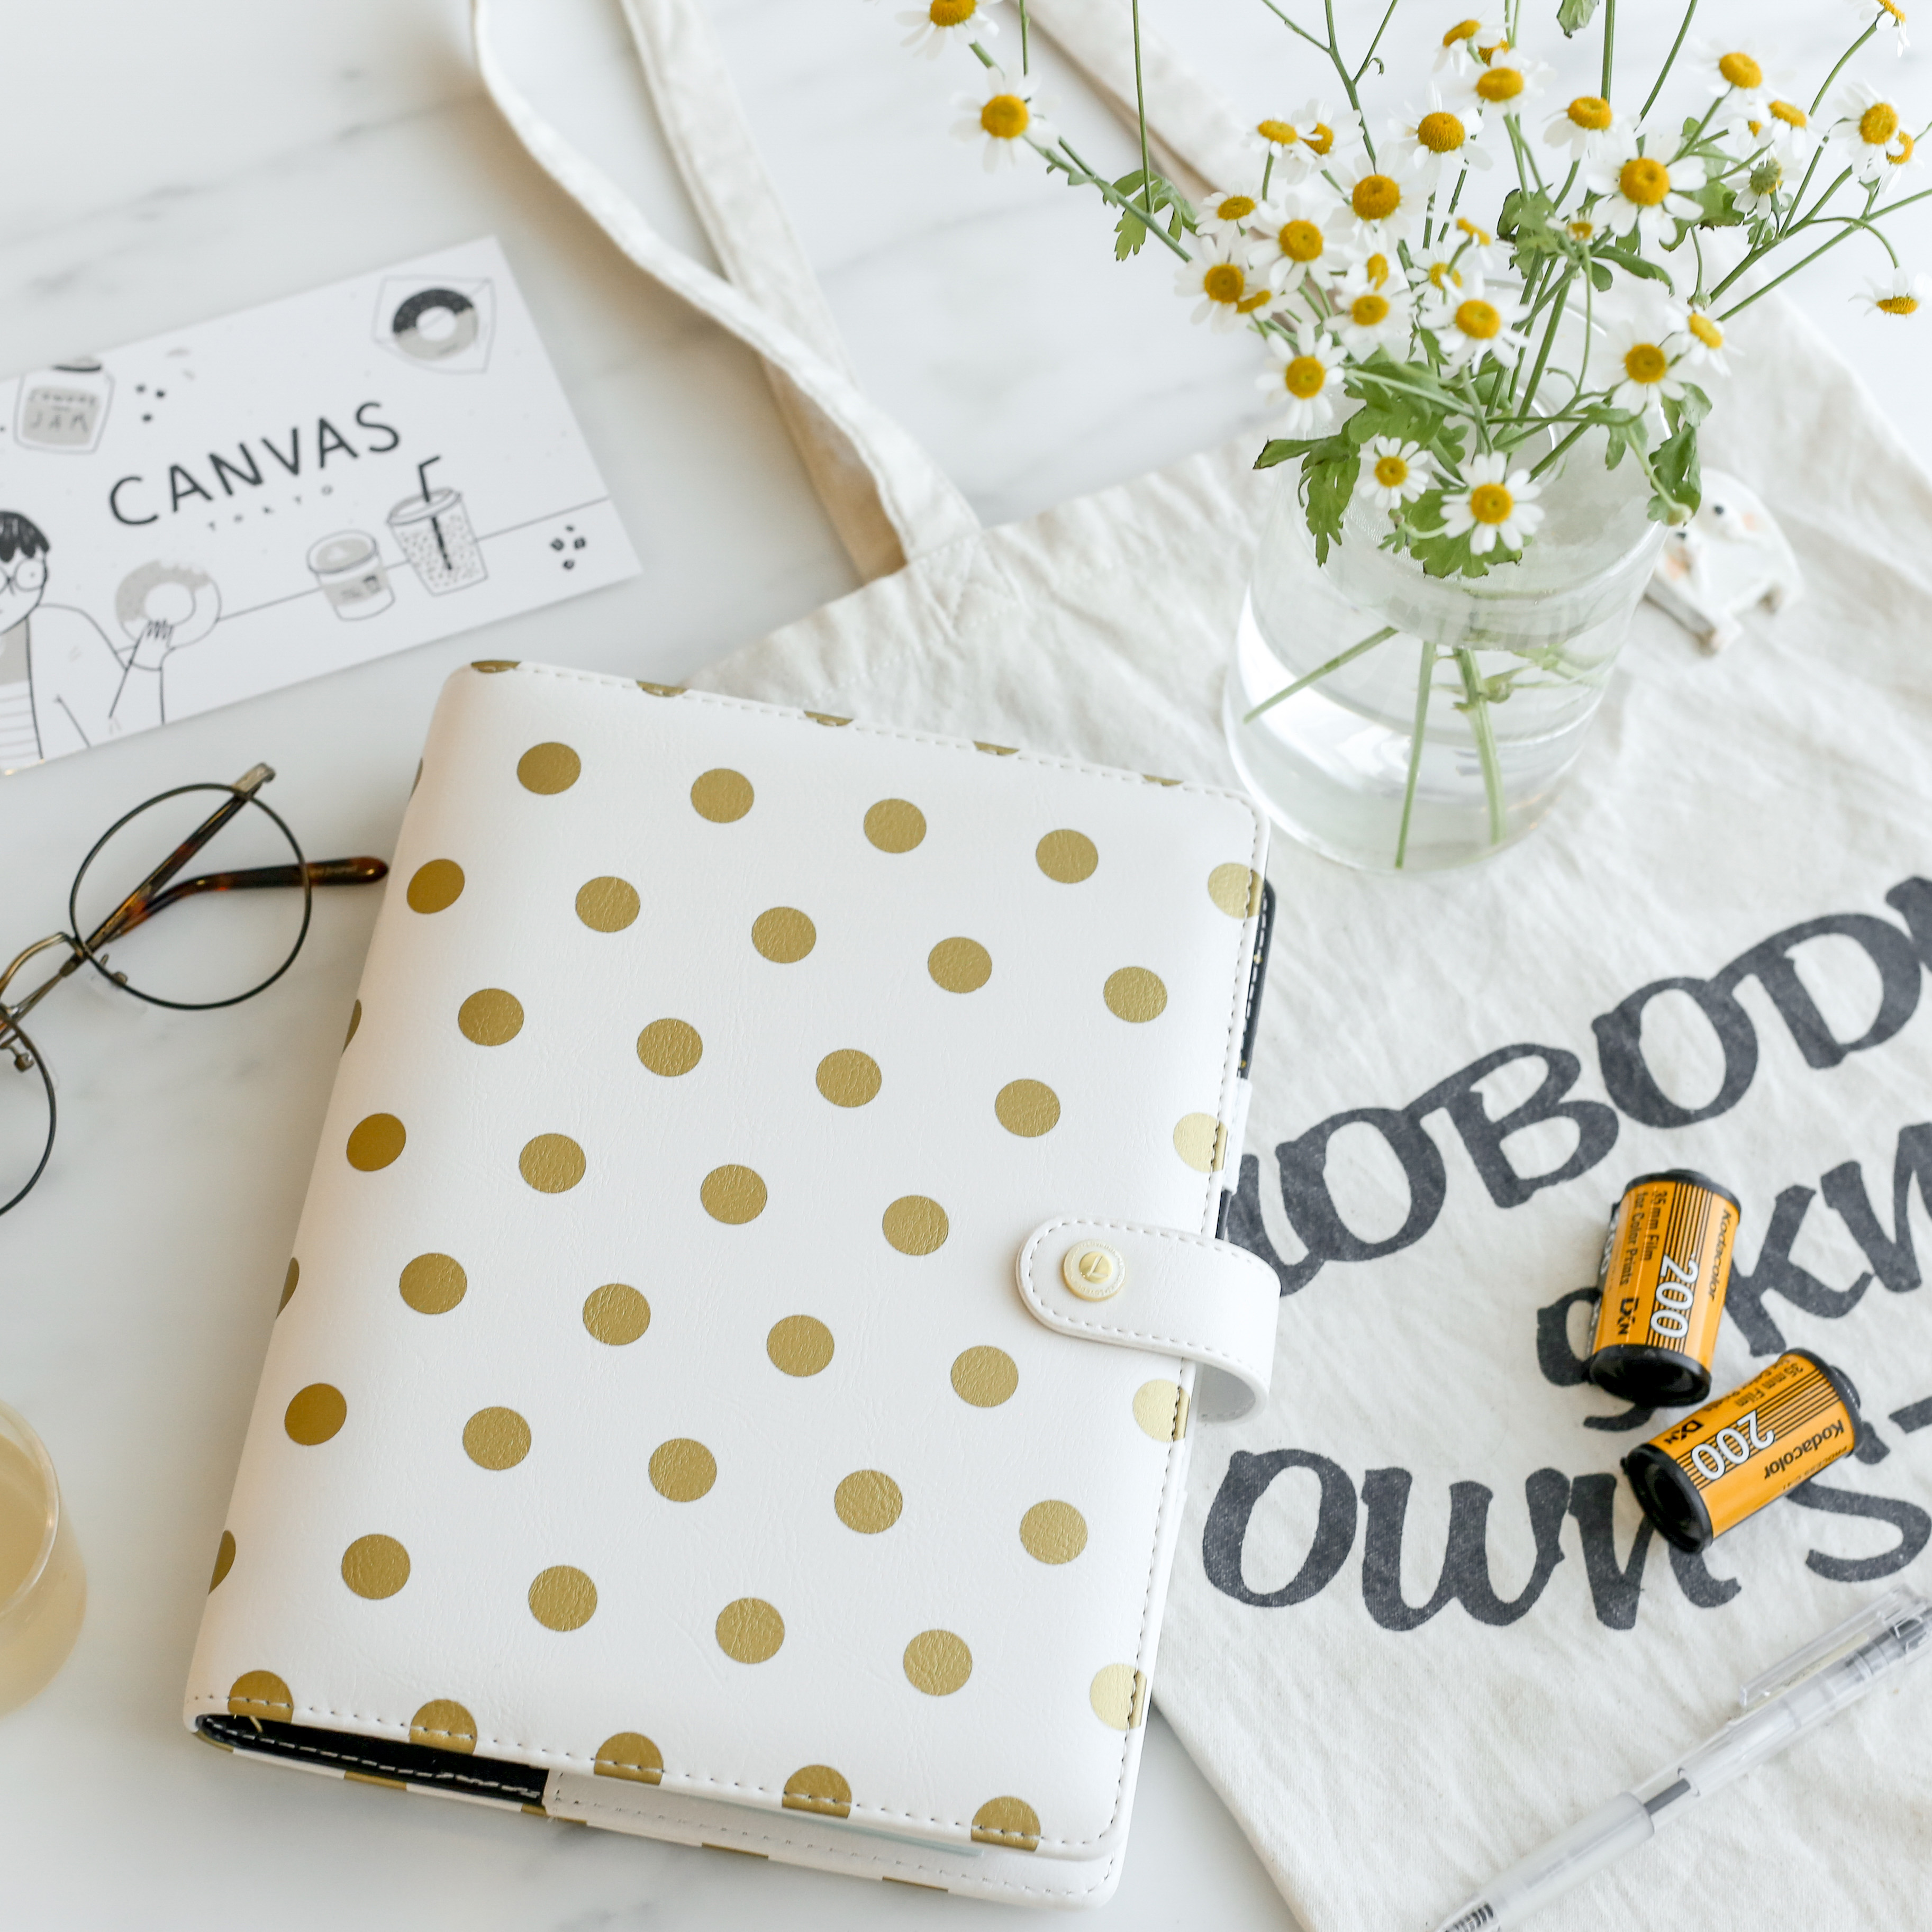 Lovedoki Snow Kawaii Notebooks And Journals A5 Spiral Planner Organizer Diary Creative Gift Stationery School Student Supplies